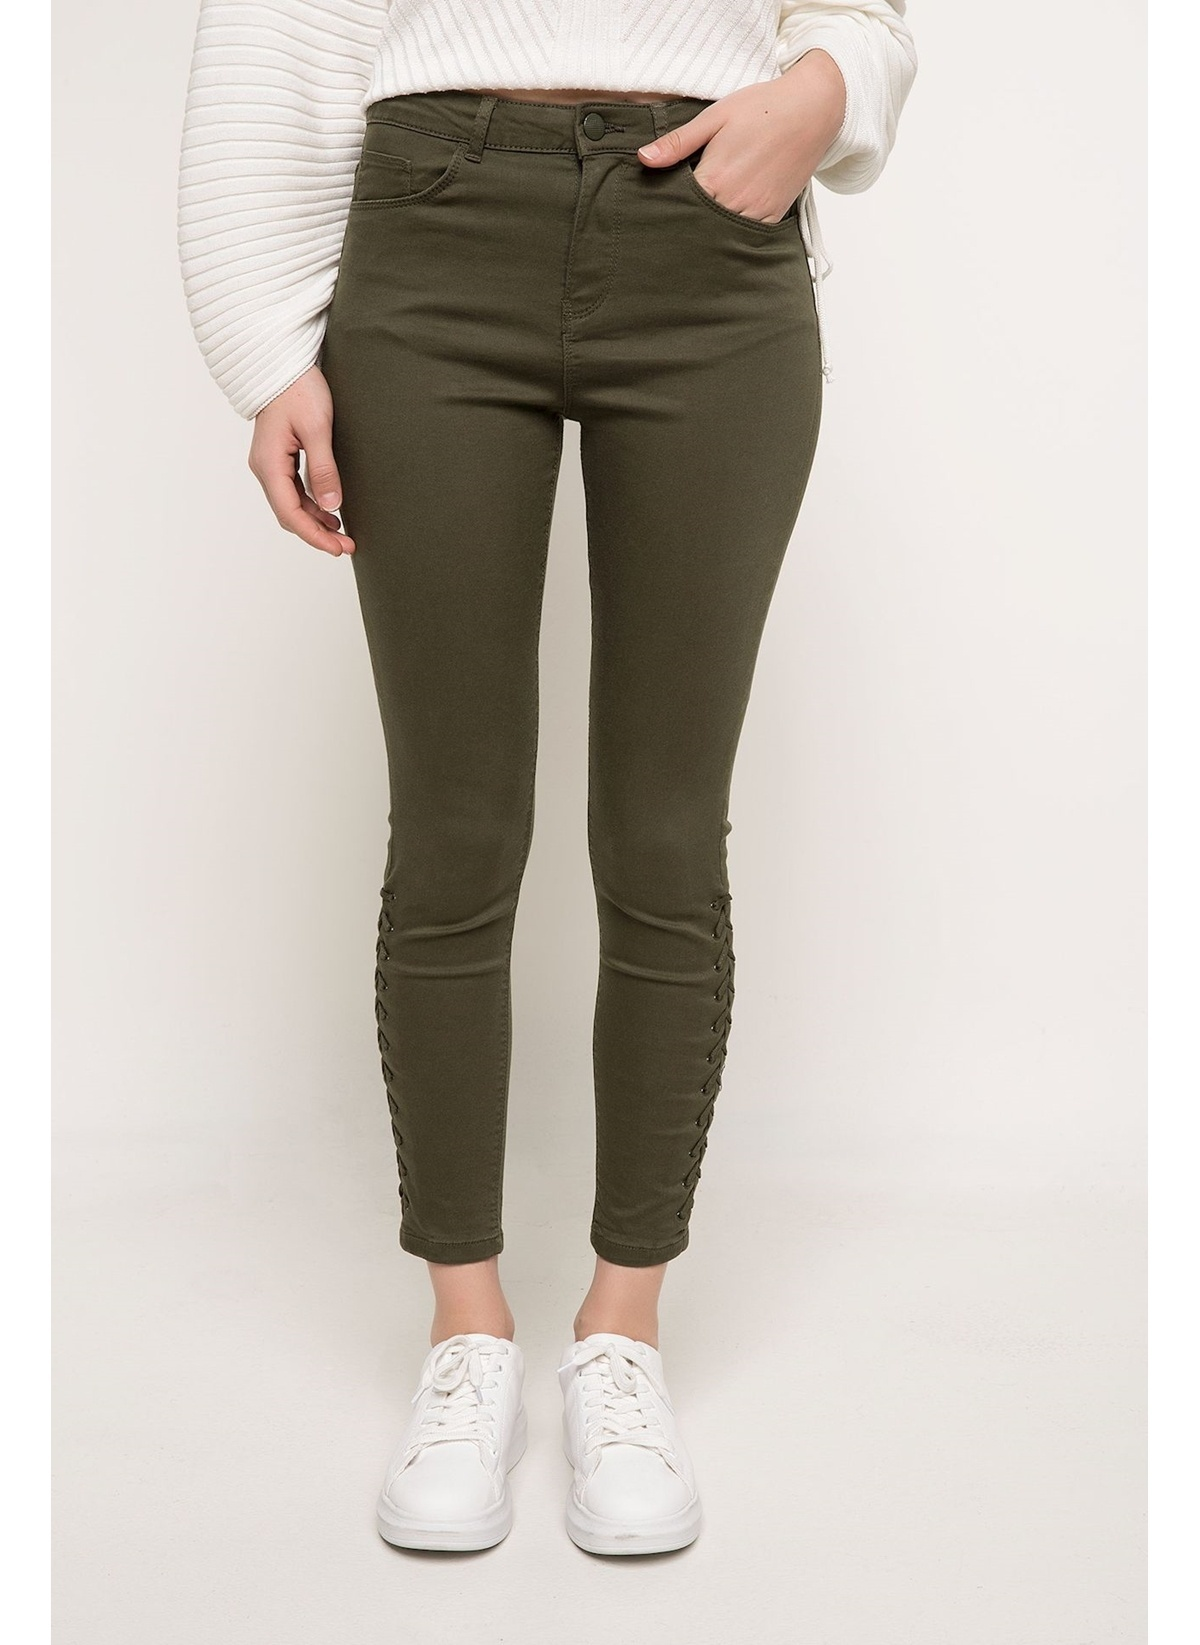 Defacto Anna Yüksek Bel Super Skinny Pantolon I0417az18spgn575pantolon – 59.99 TL